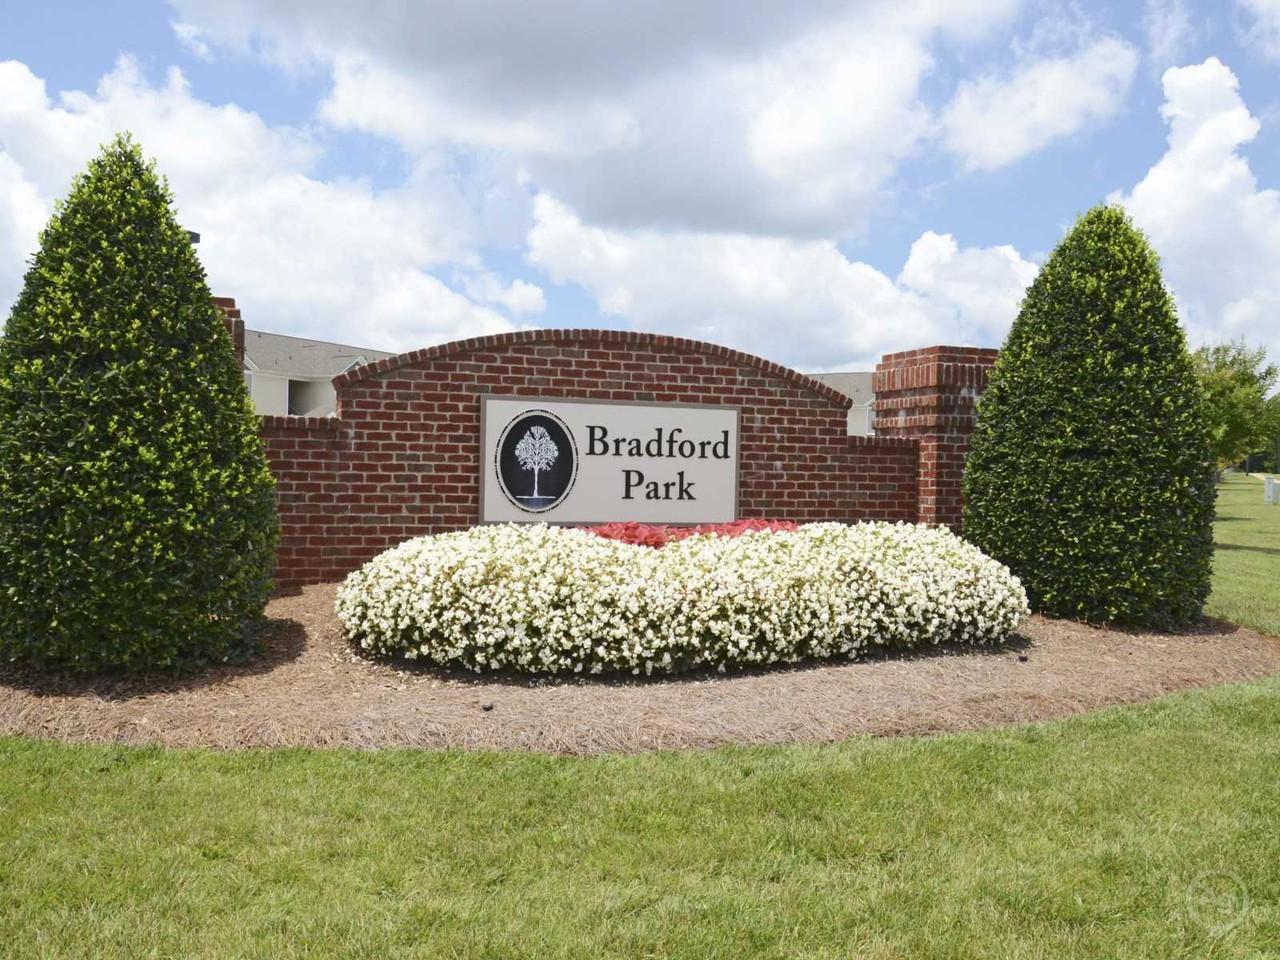 Bradford Park - 417 Bushmill Dr, Rock Hill, SC 29730 - Apartment for ...